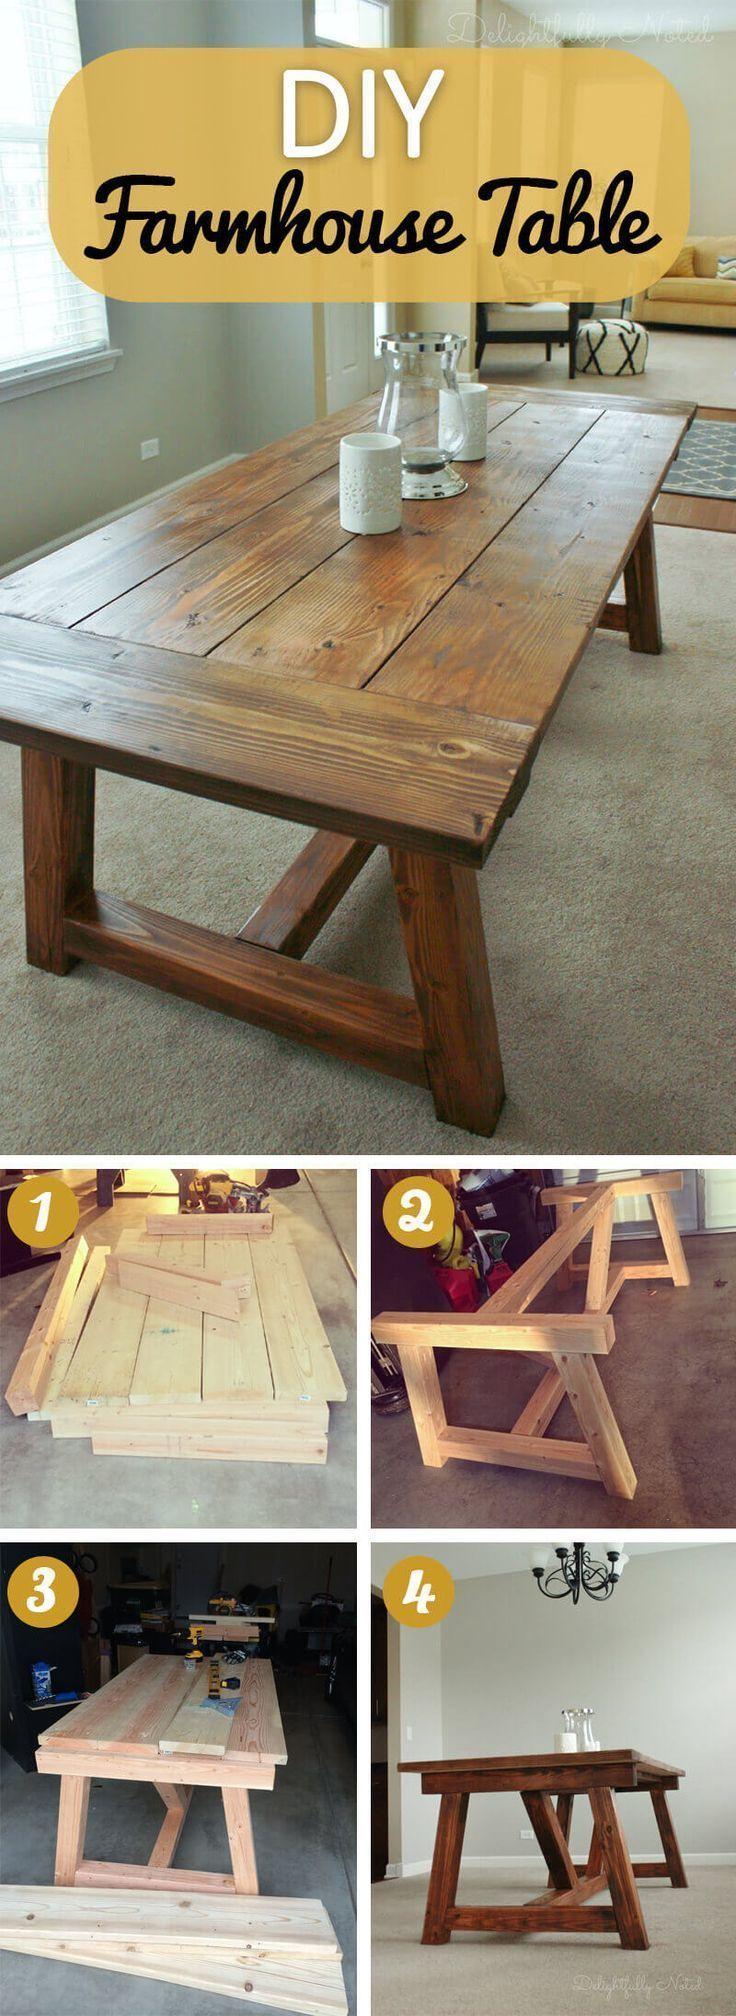 15+ Rustic DIY Farmhouse Table Ideas For Your Dinning Room  Build the Designer T...#build #designer #dinning #diy #farmhouse #ideas #room #rustic #table